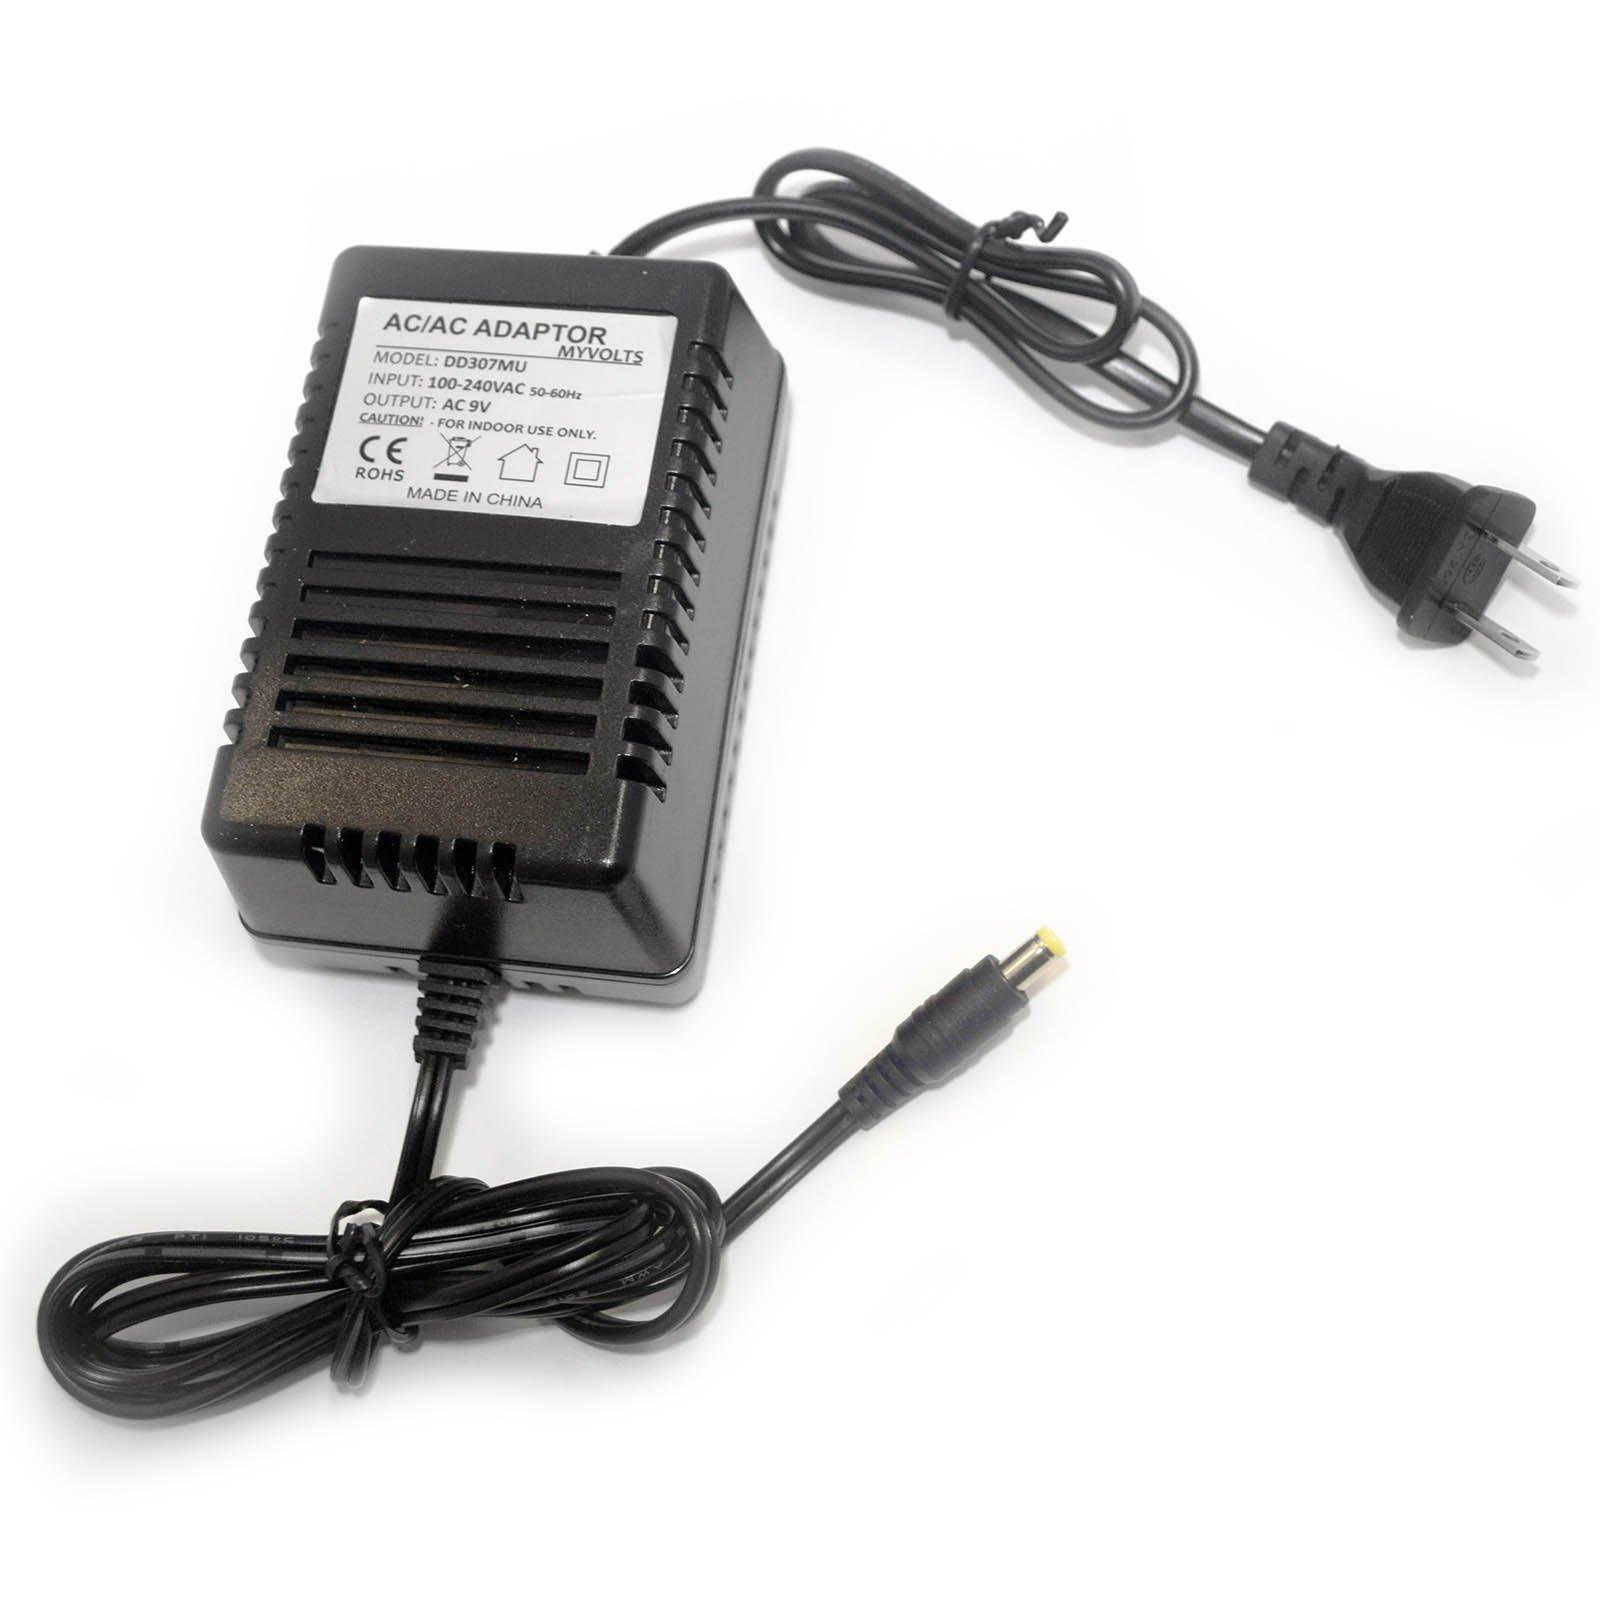 9V Ion iDM02 Drum machine replacement power supply adaptor - US plug